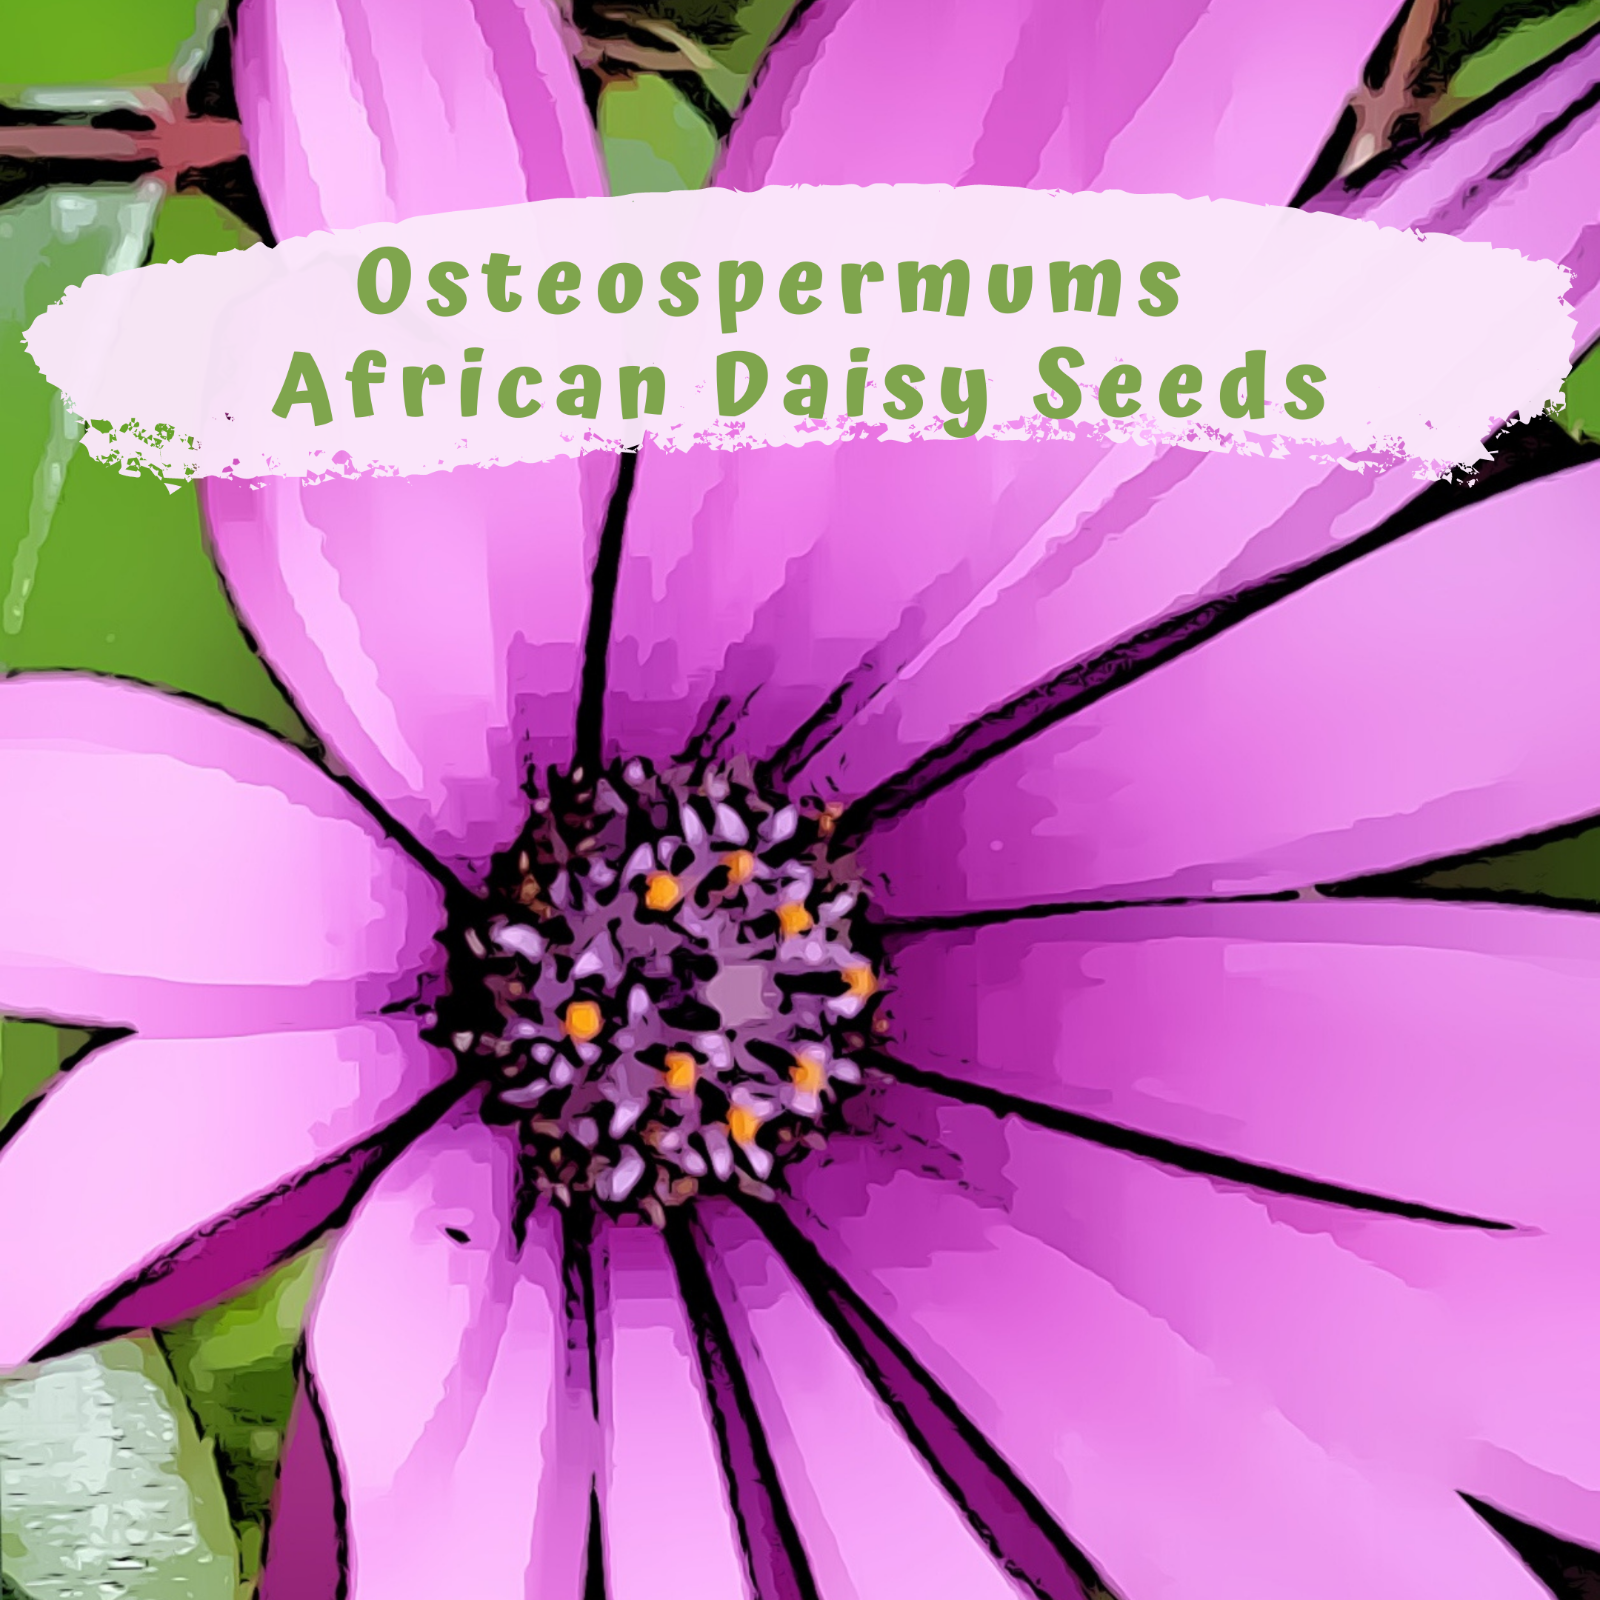 Osteospermums - Daisy Flower Seeds (40 plus seeds)